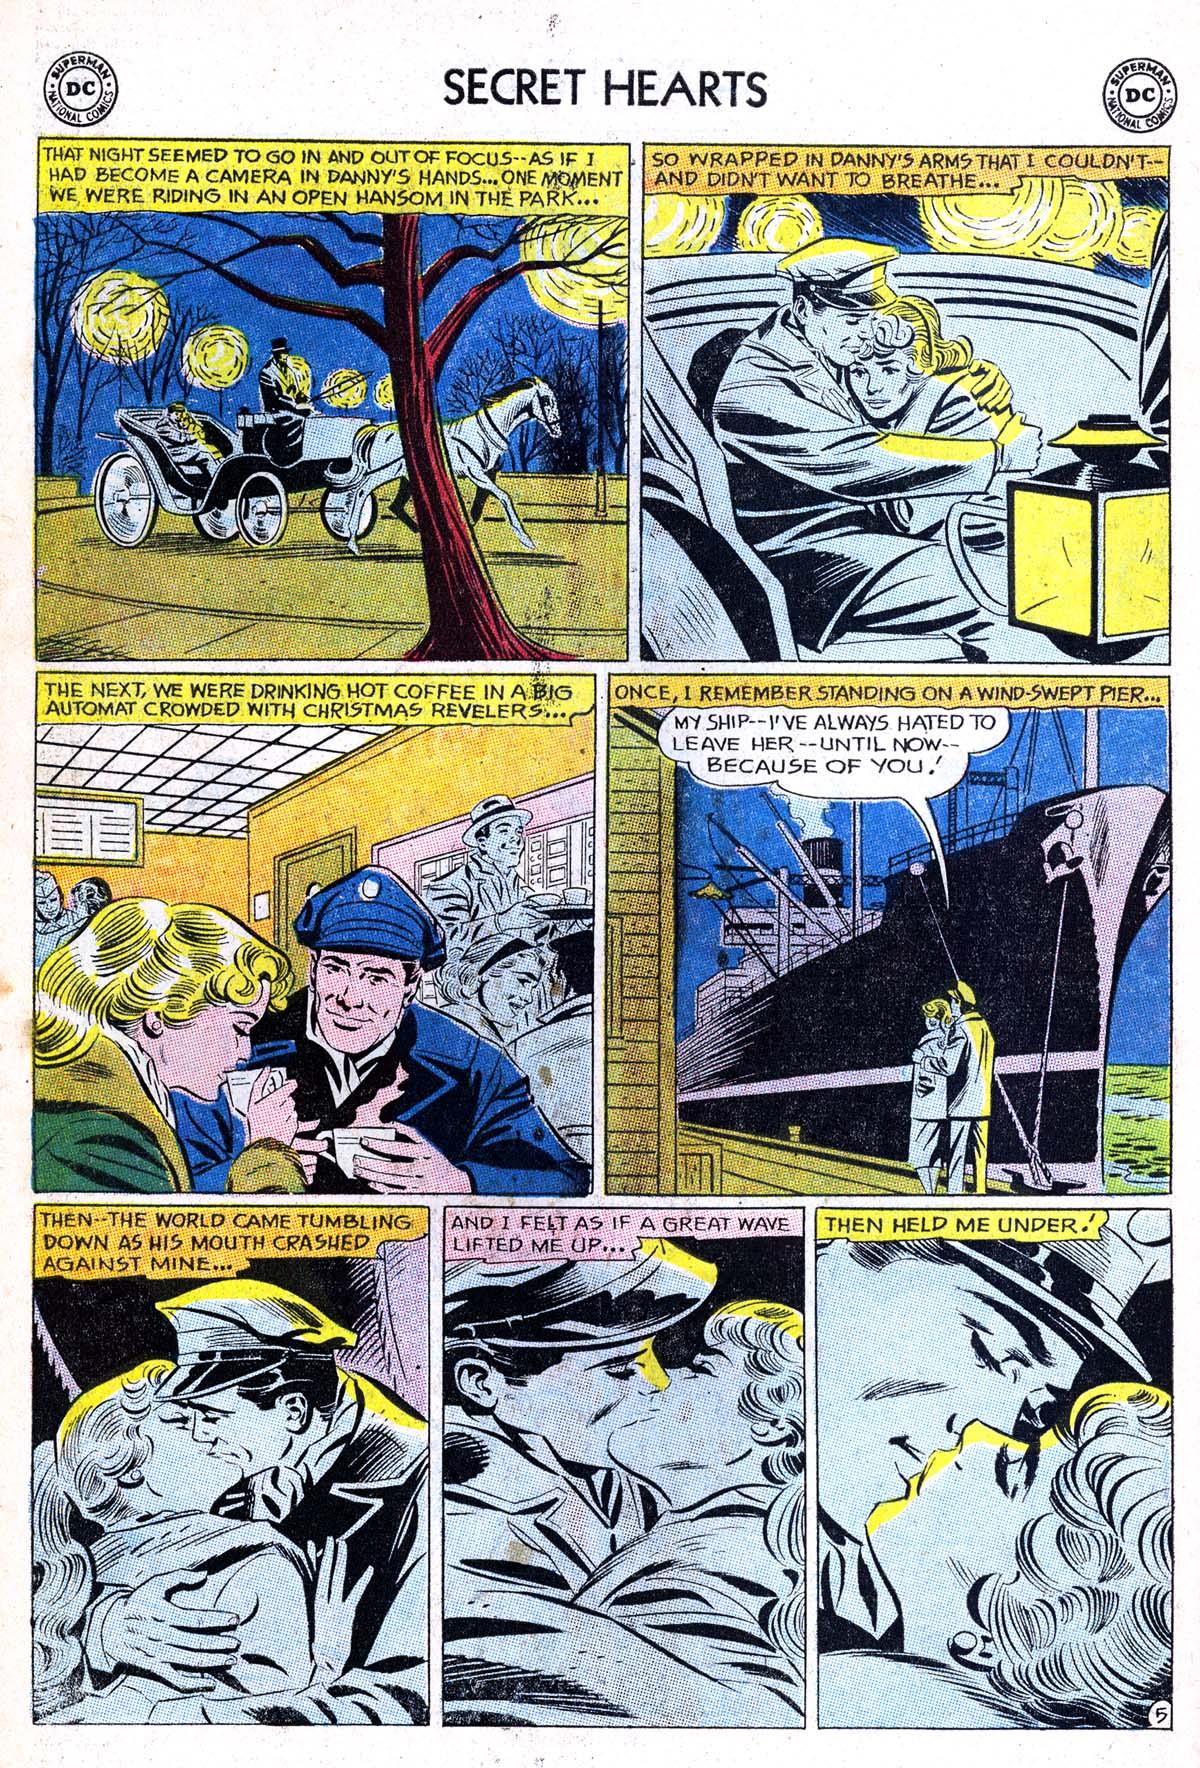 Read online Secret Hearts comic -  Issue #85 - 22